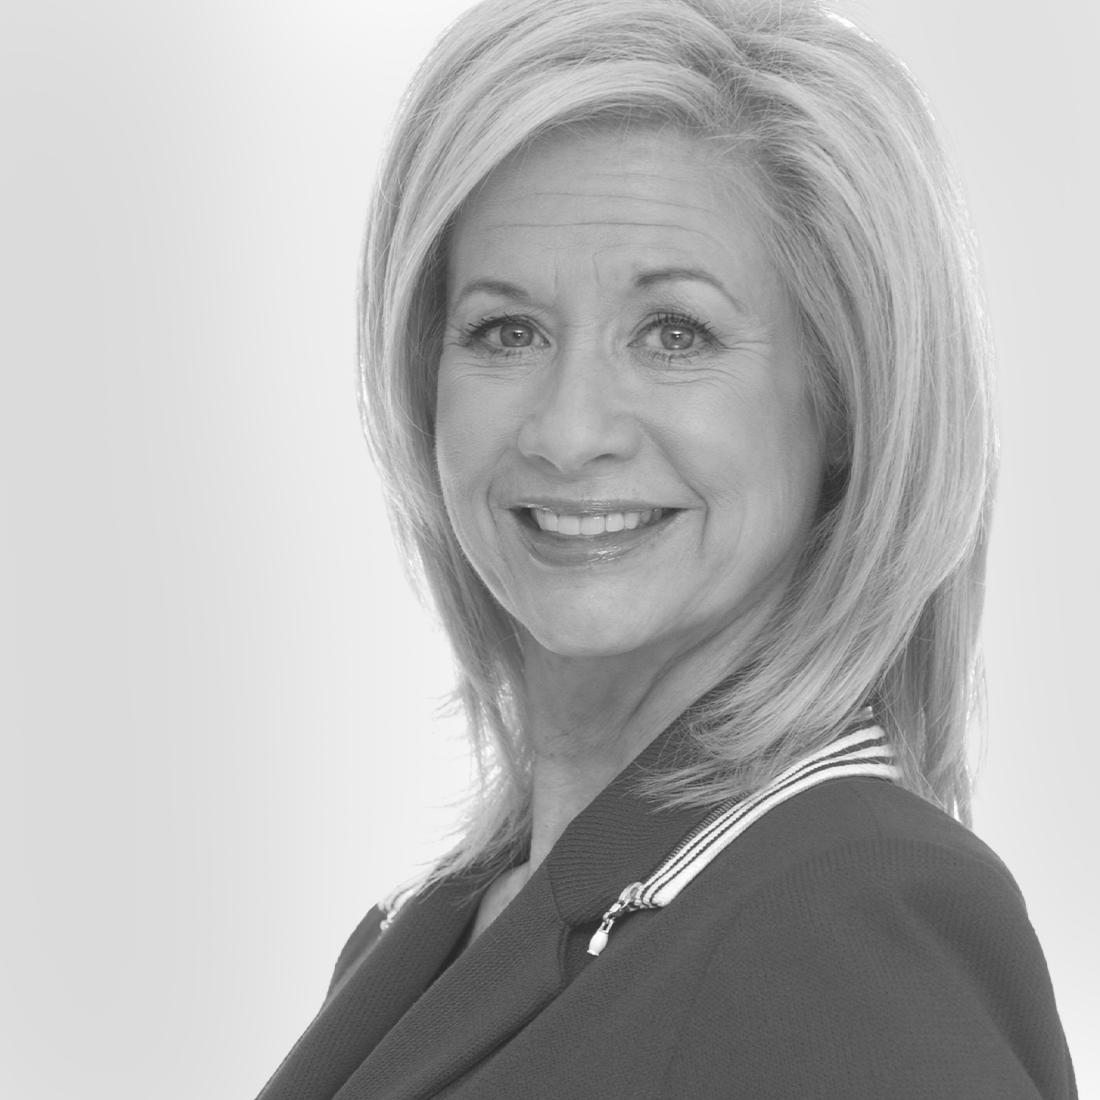 <p><strong>Jennifer Closshey Ph.D</strong><br>Strategy Advisor</p>